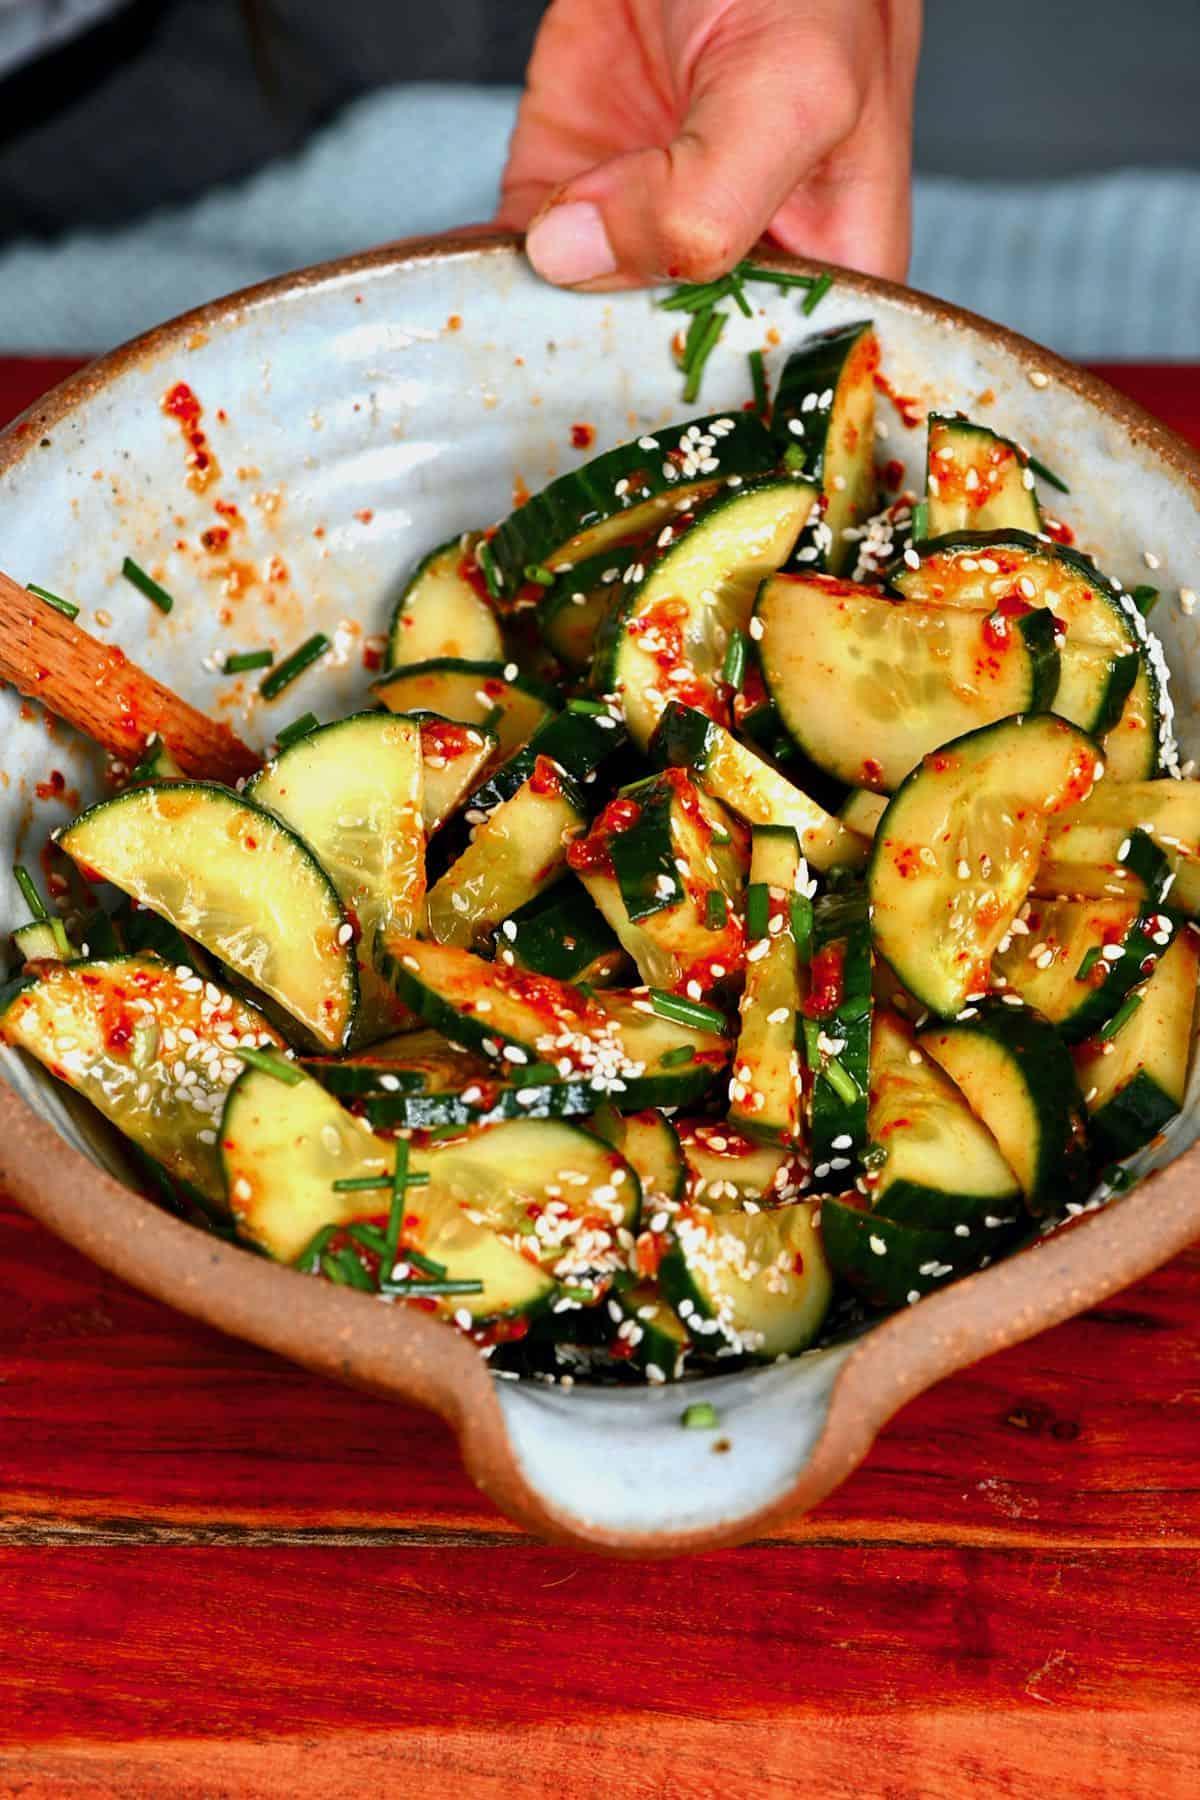 A bowl with Korean cucumber salad